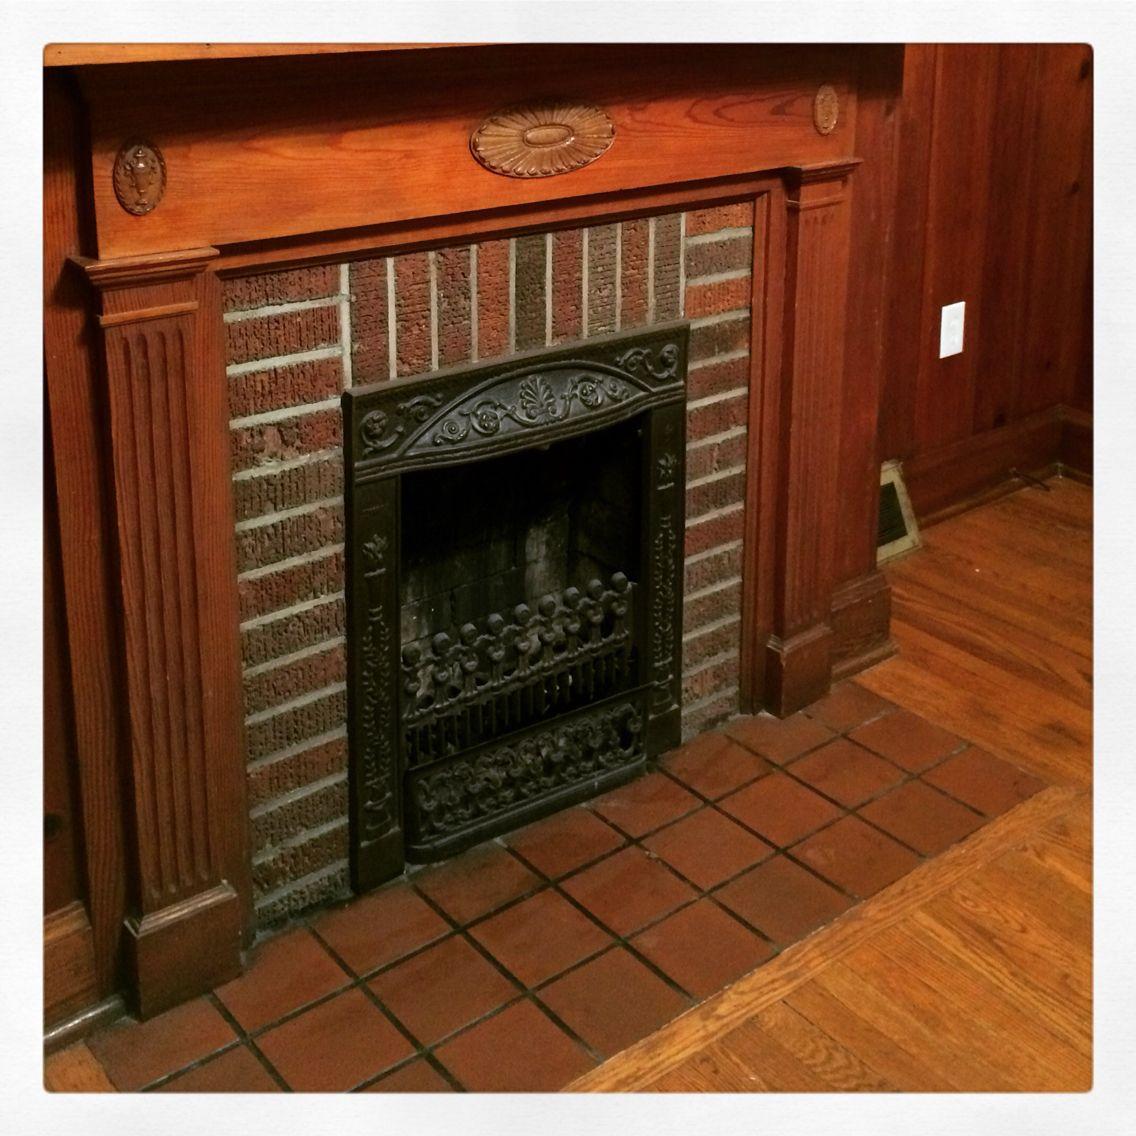 Beautiful Original 1940's Fireplace. #fireplace #1940s